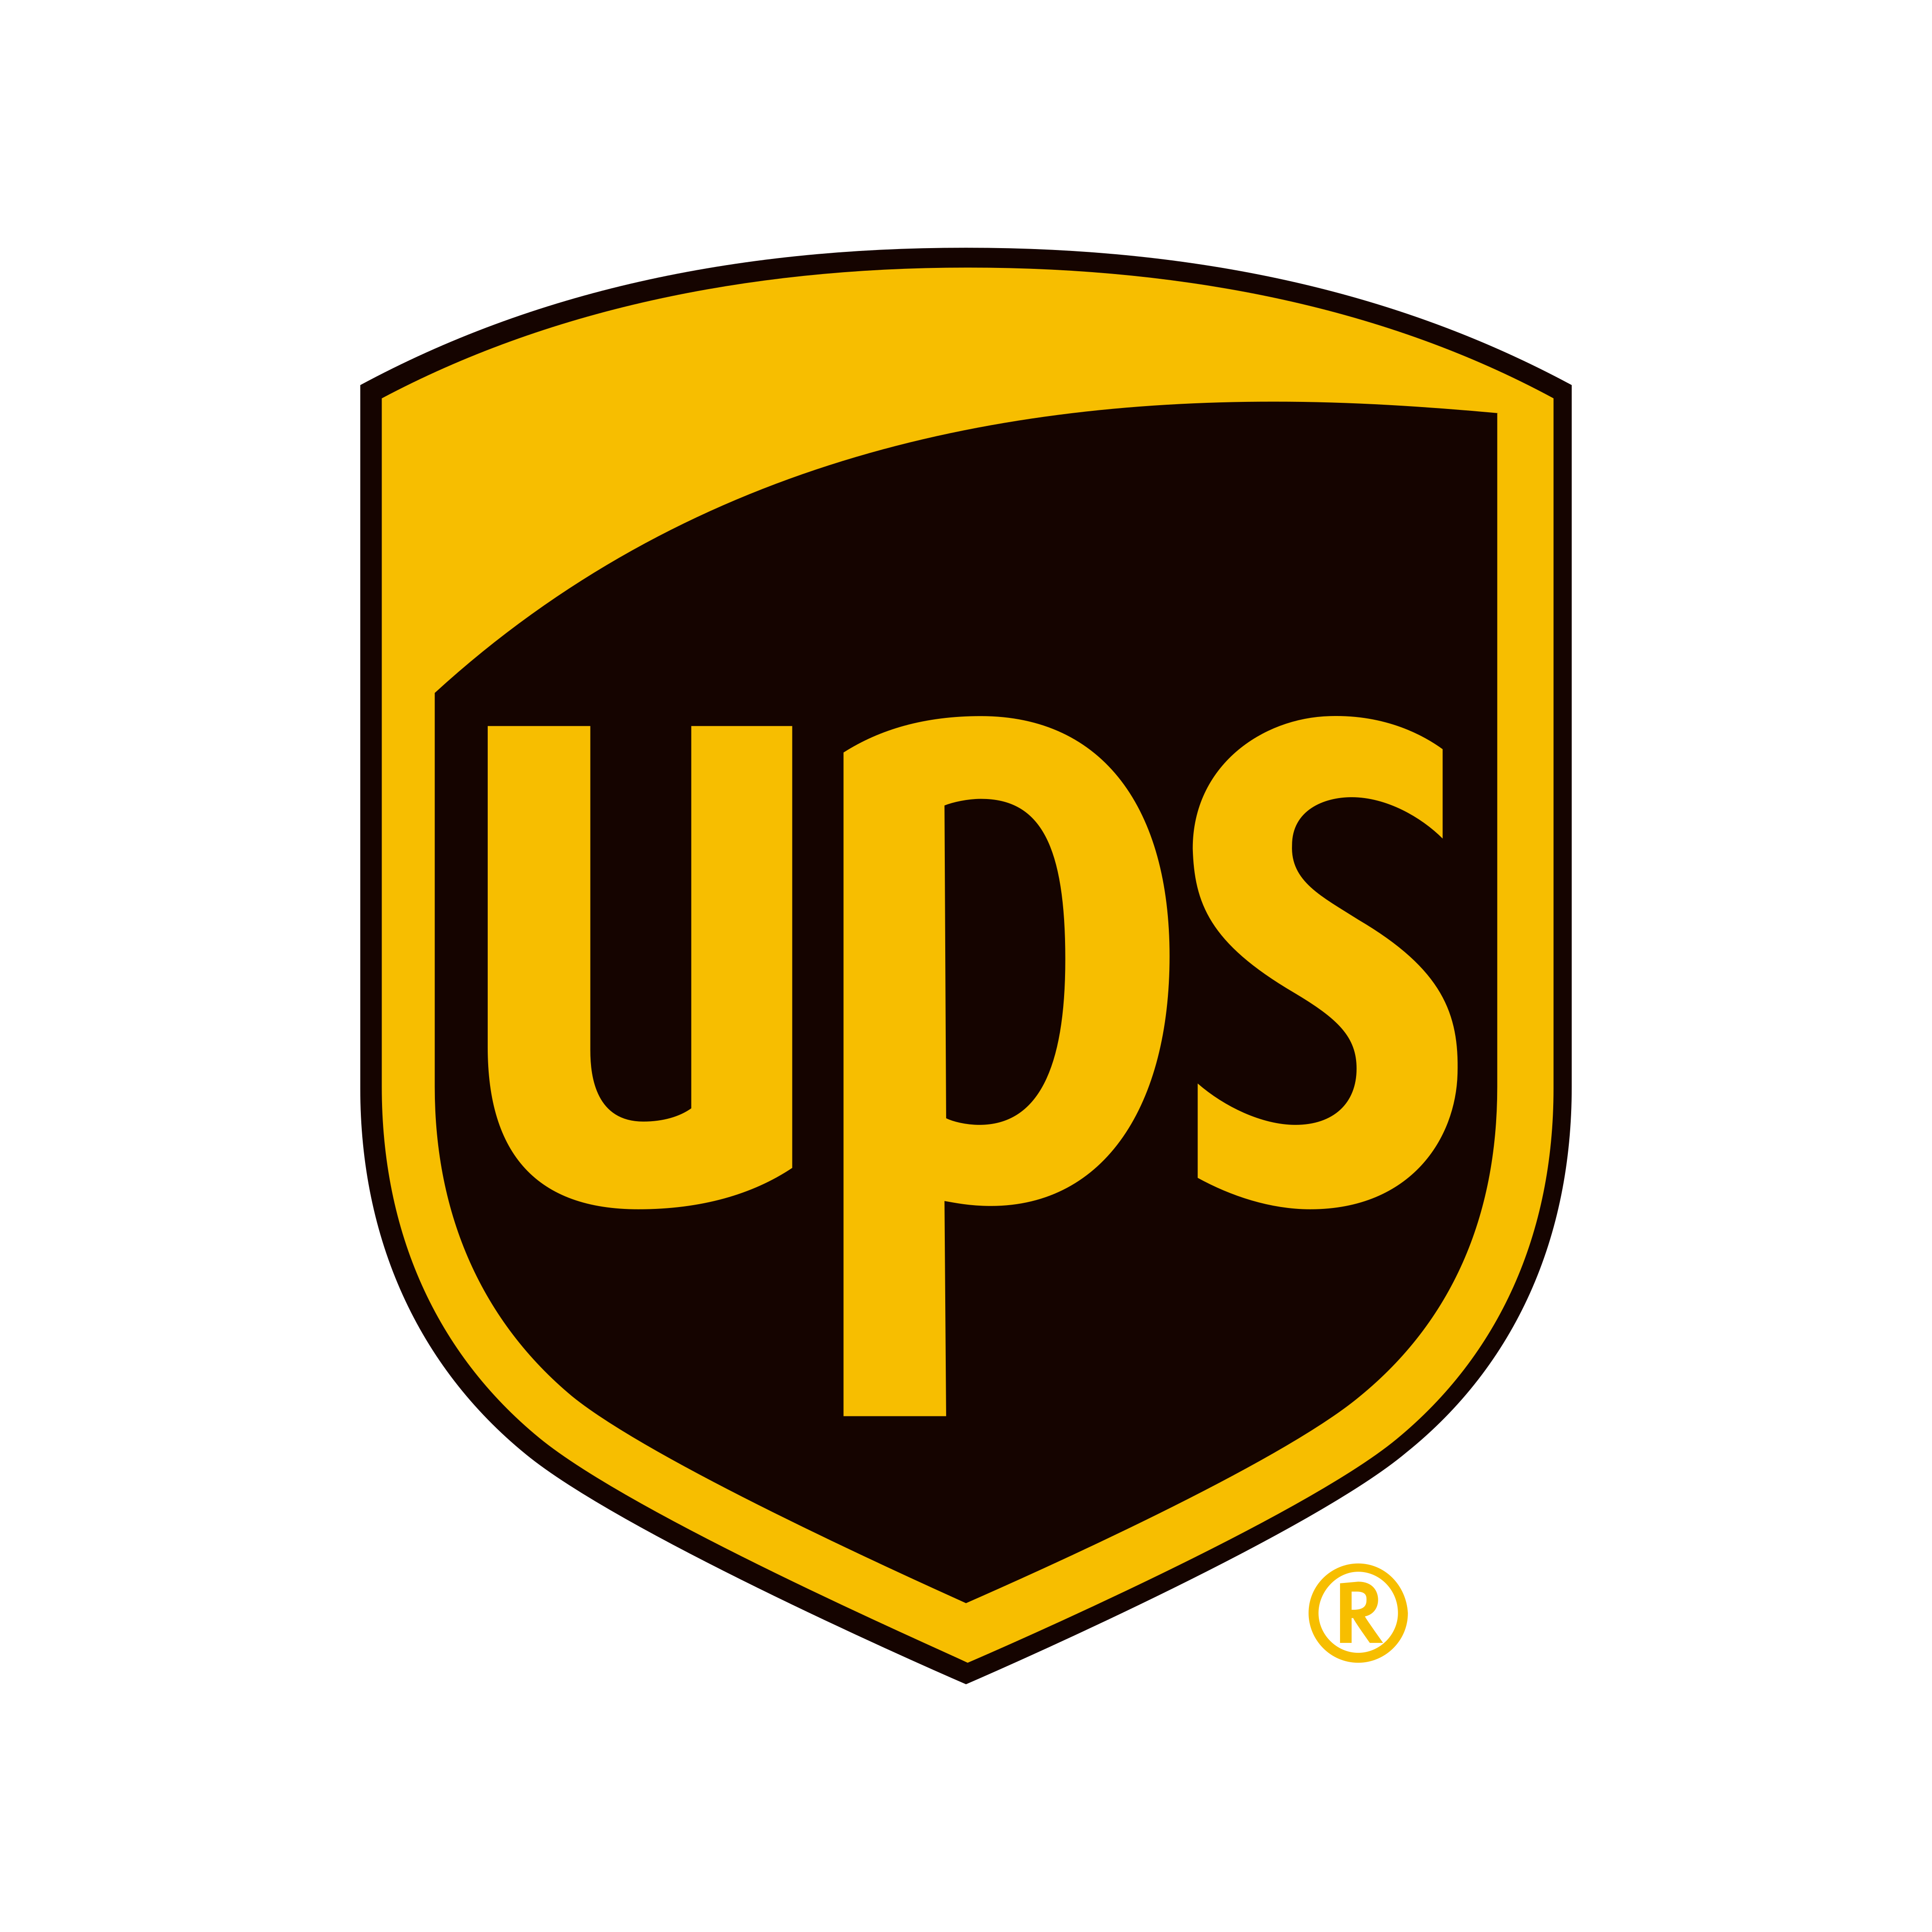 ups logo 0 - UPS Logo